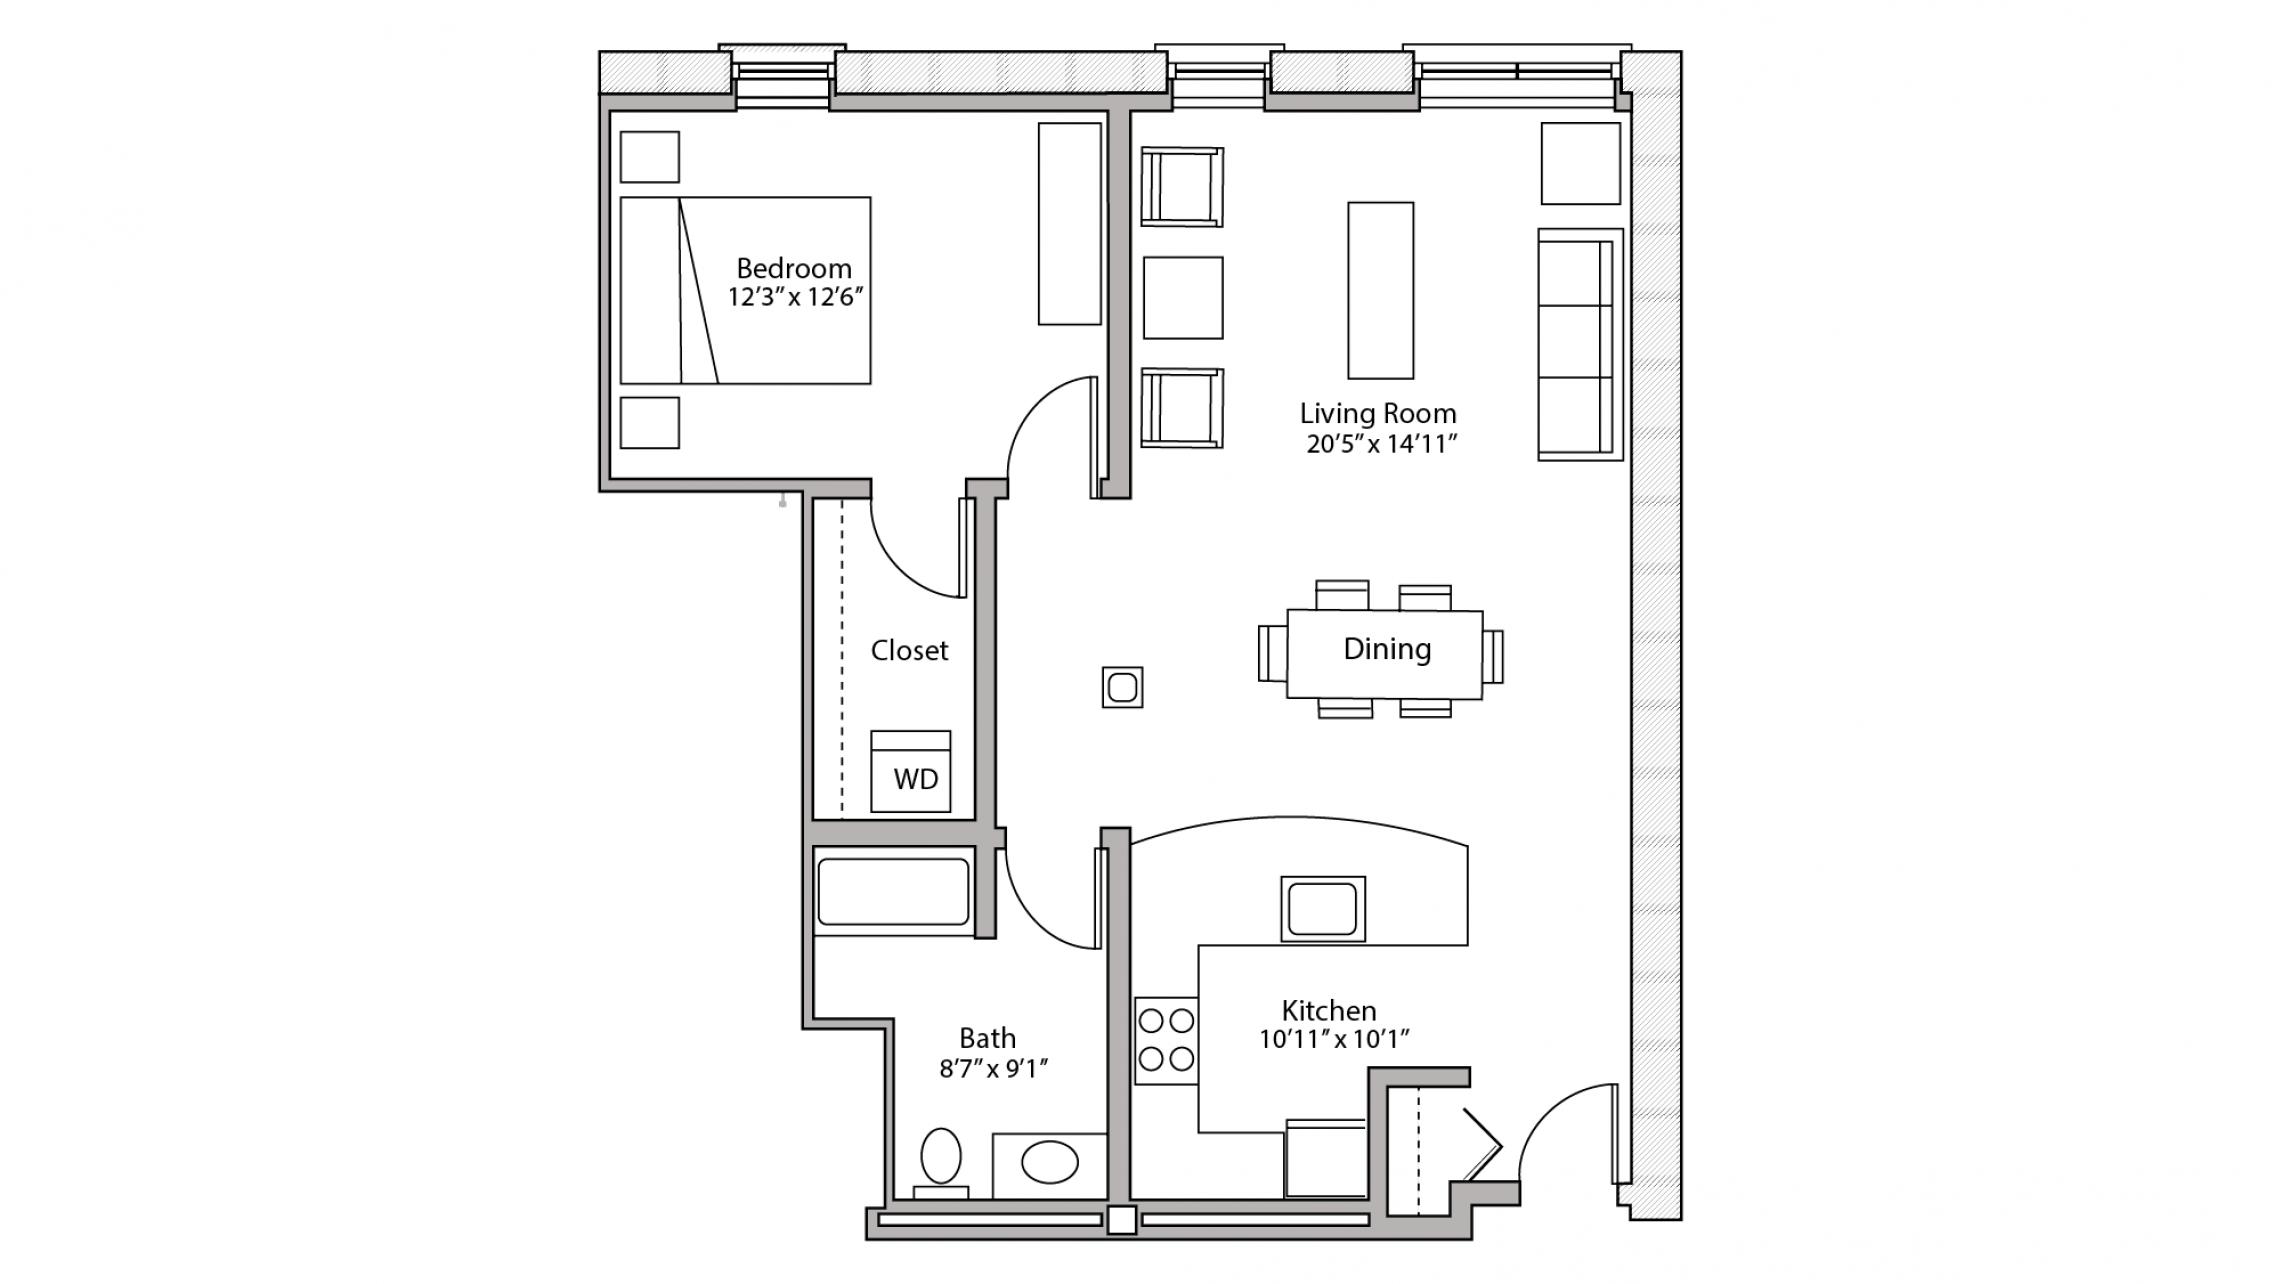 ULI Tobacco Lofts W209 - One Bedroom, One Bathroom